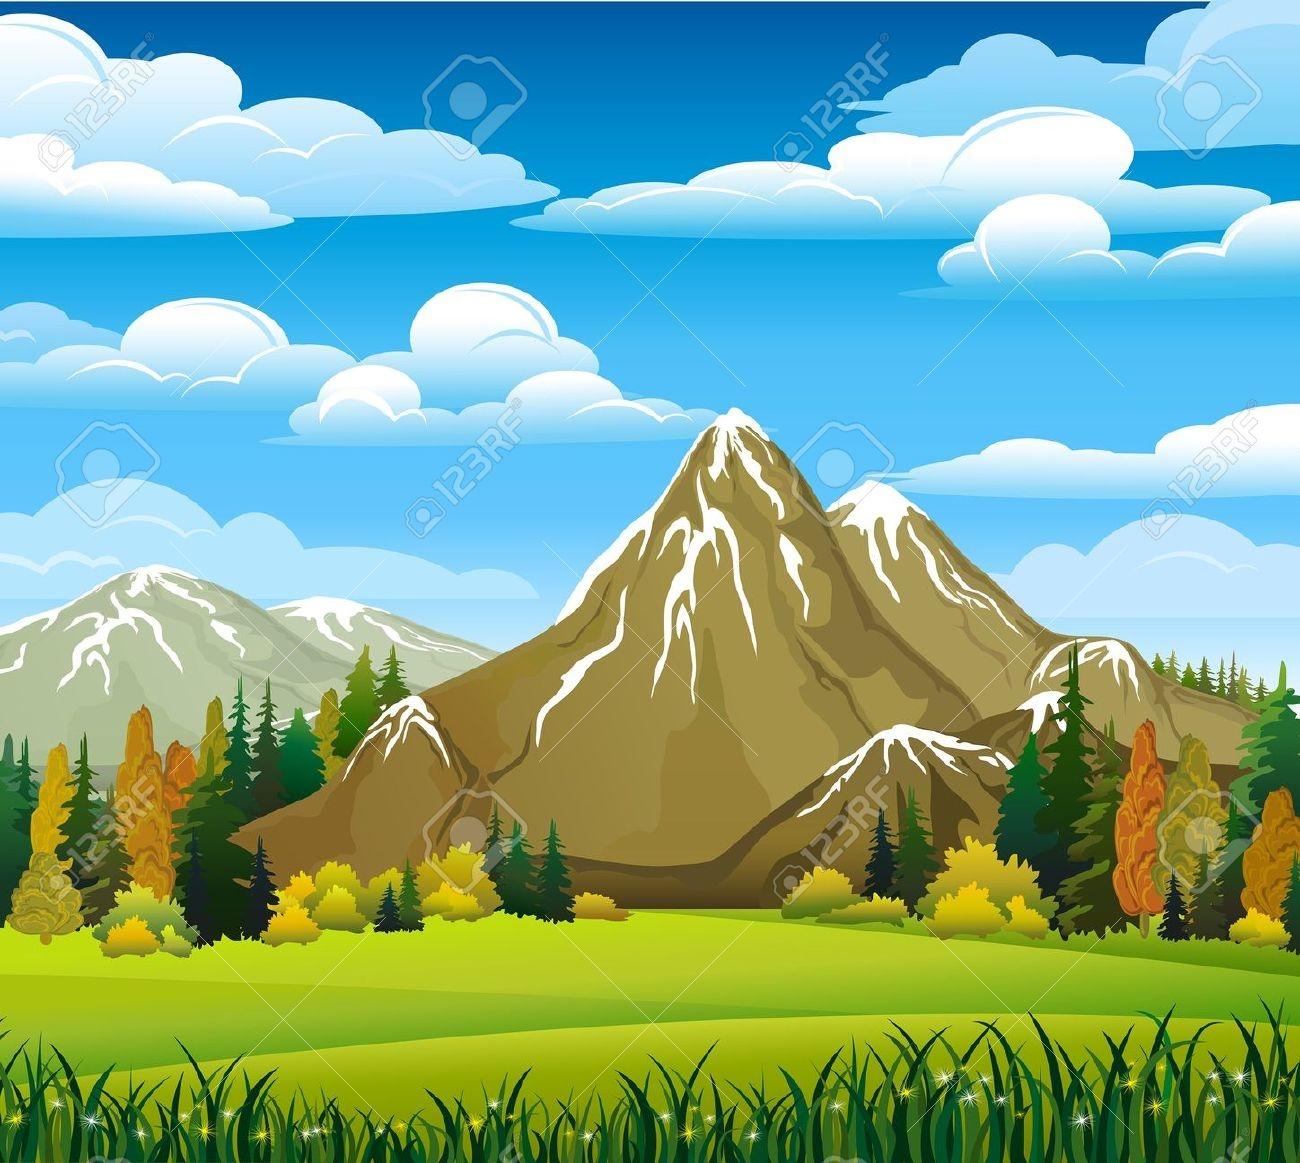 Mountain meadows clipart - Clipground